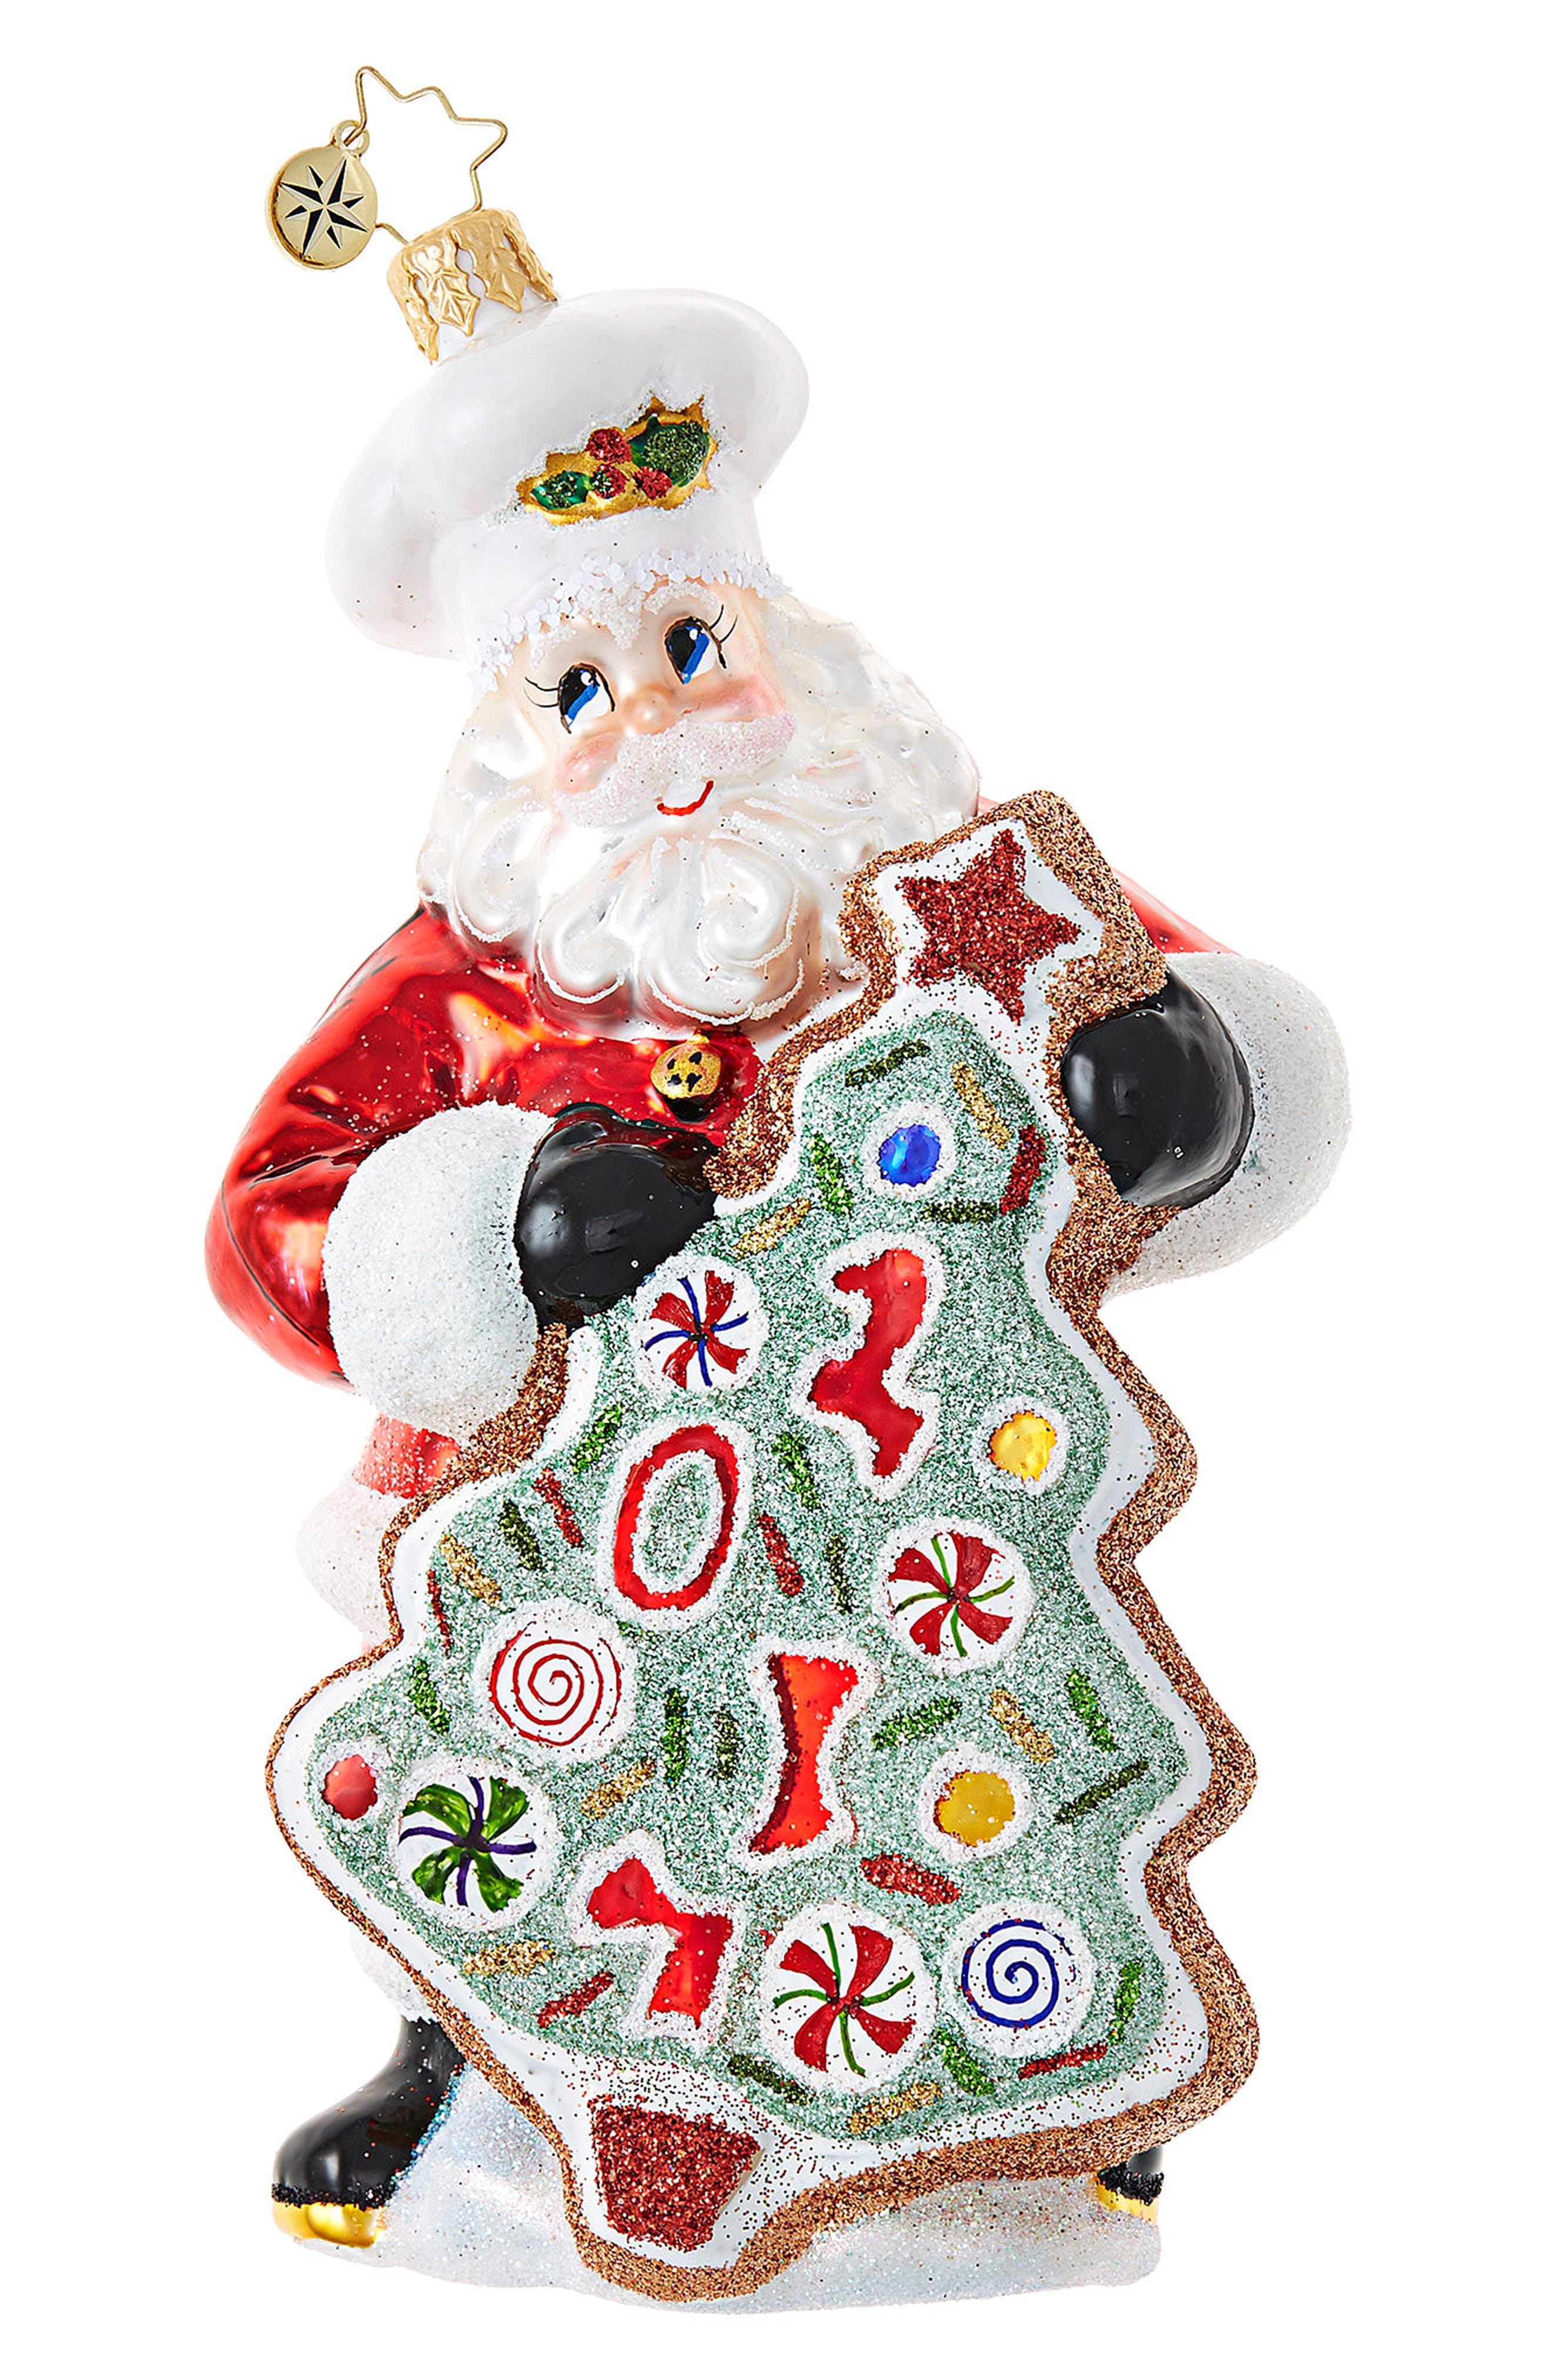 Christopher Radko Sugar Cookie Kris Glass Ornament